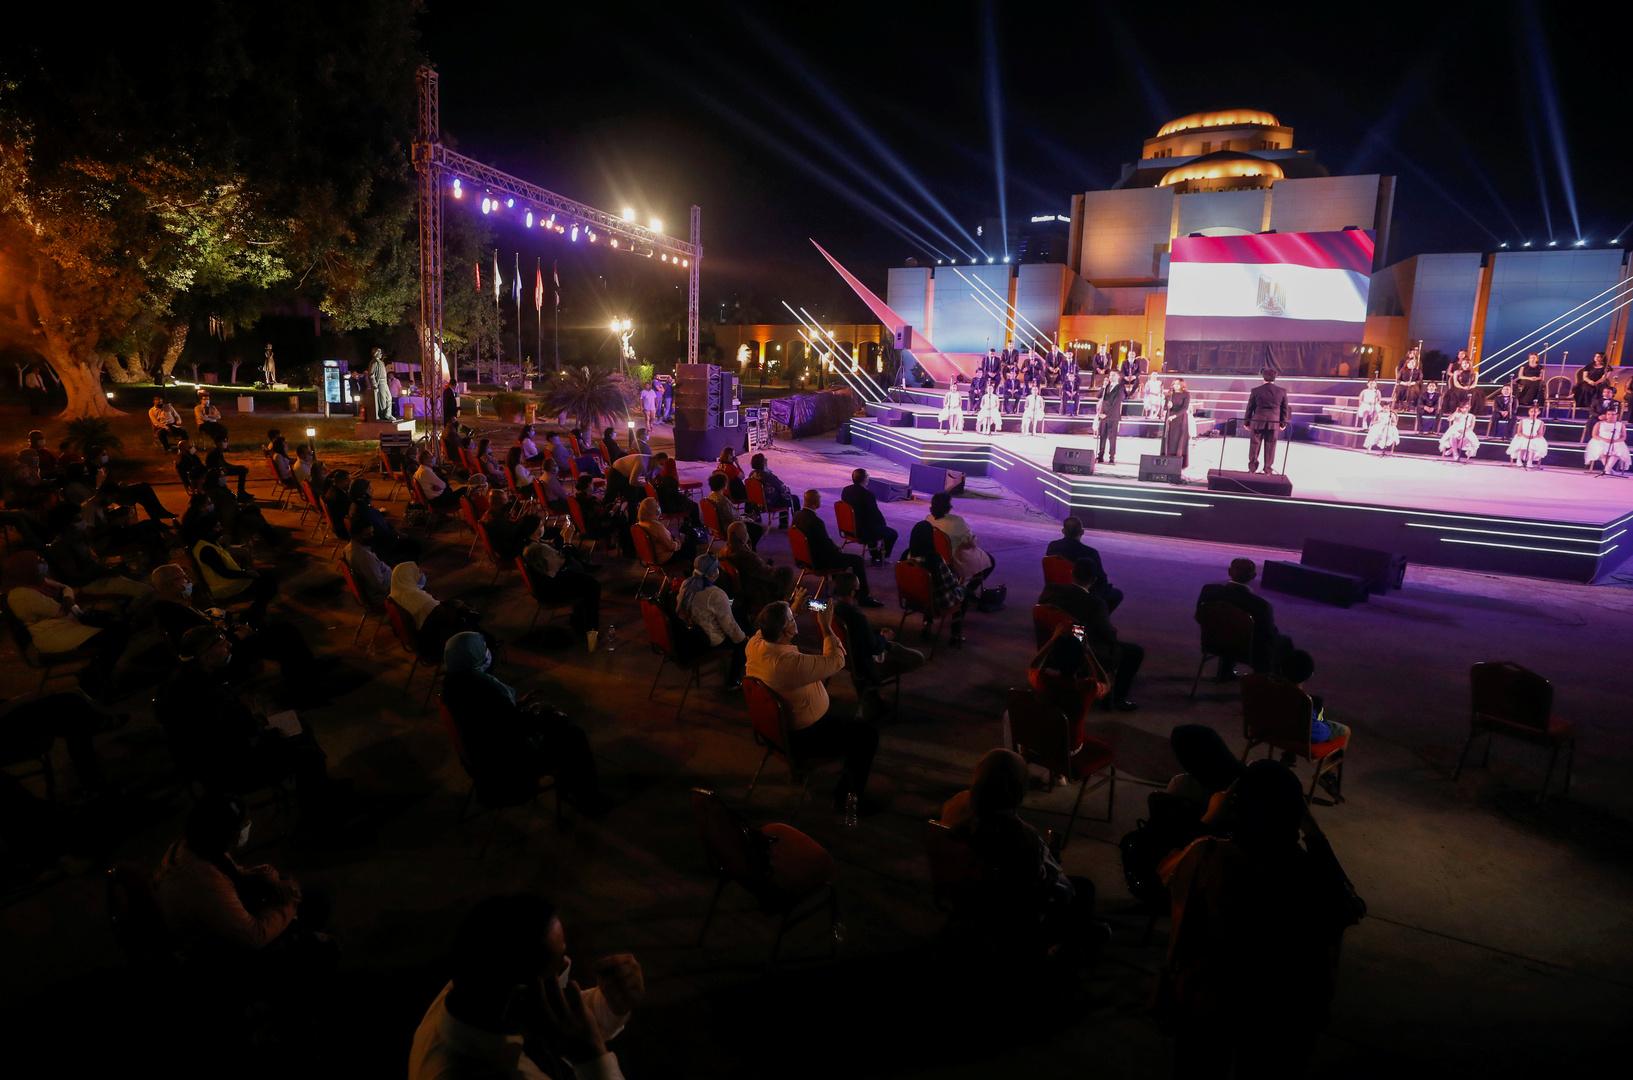 حفل في مصر